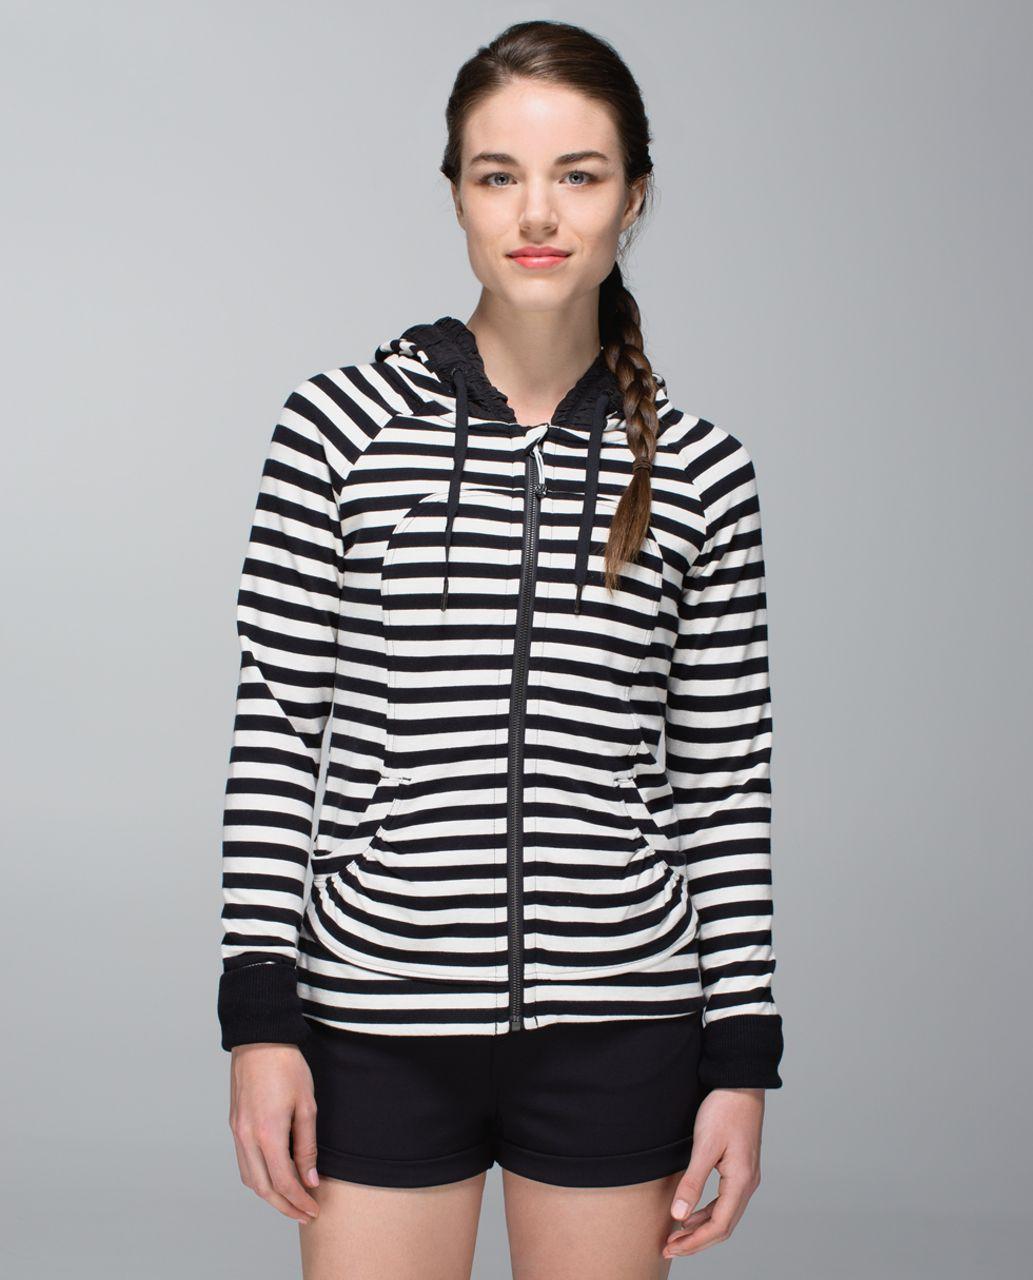 60acce08d6 Lululemon Movement Jacket - Apex Stripe Black Heathered Angel White / Black  - lulu fanatics